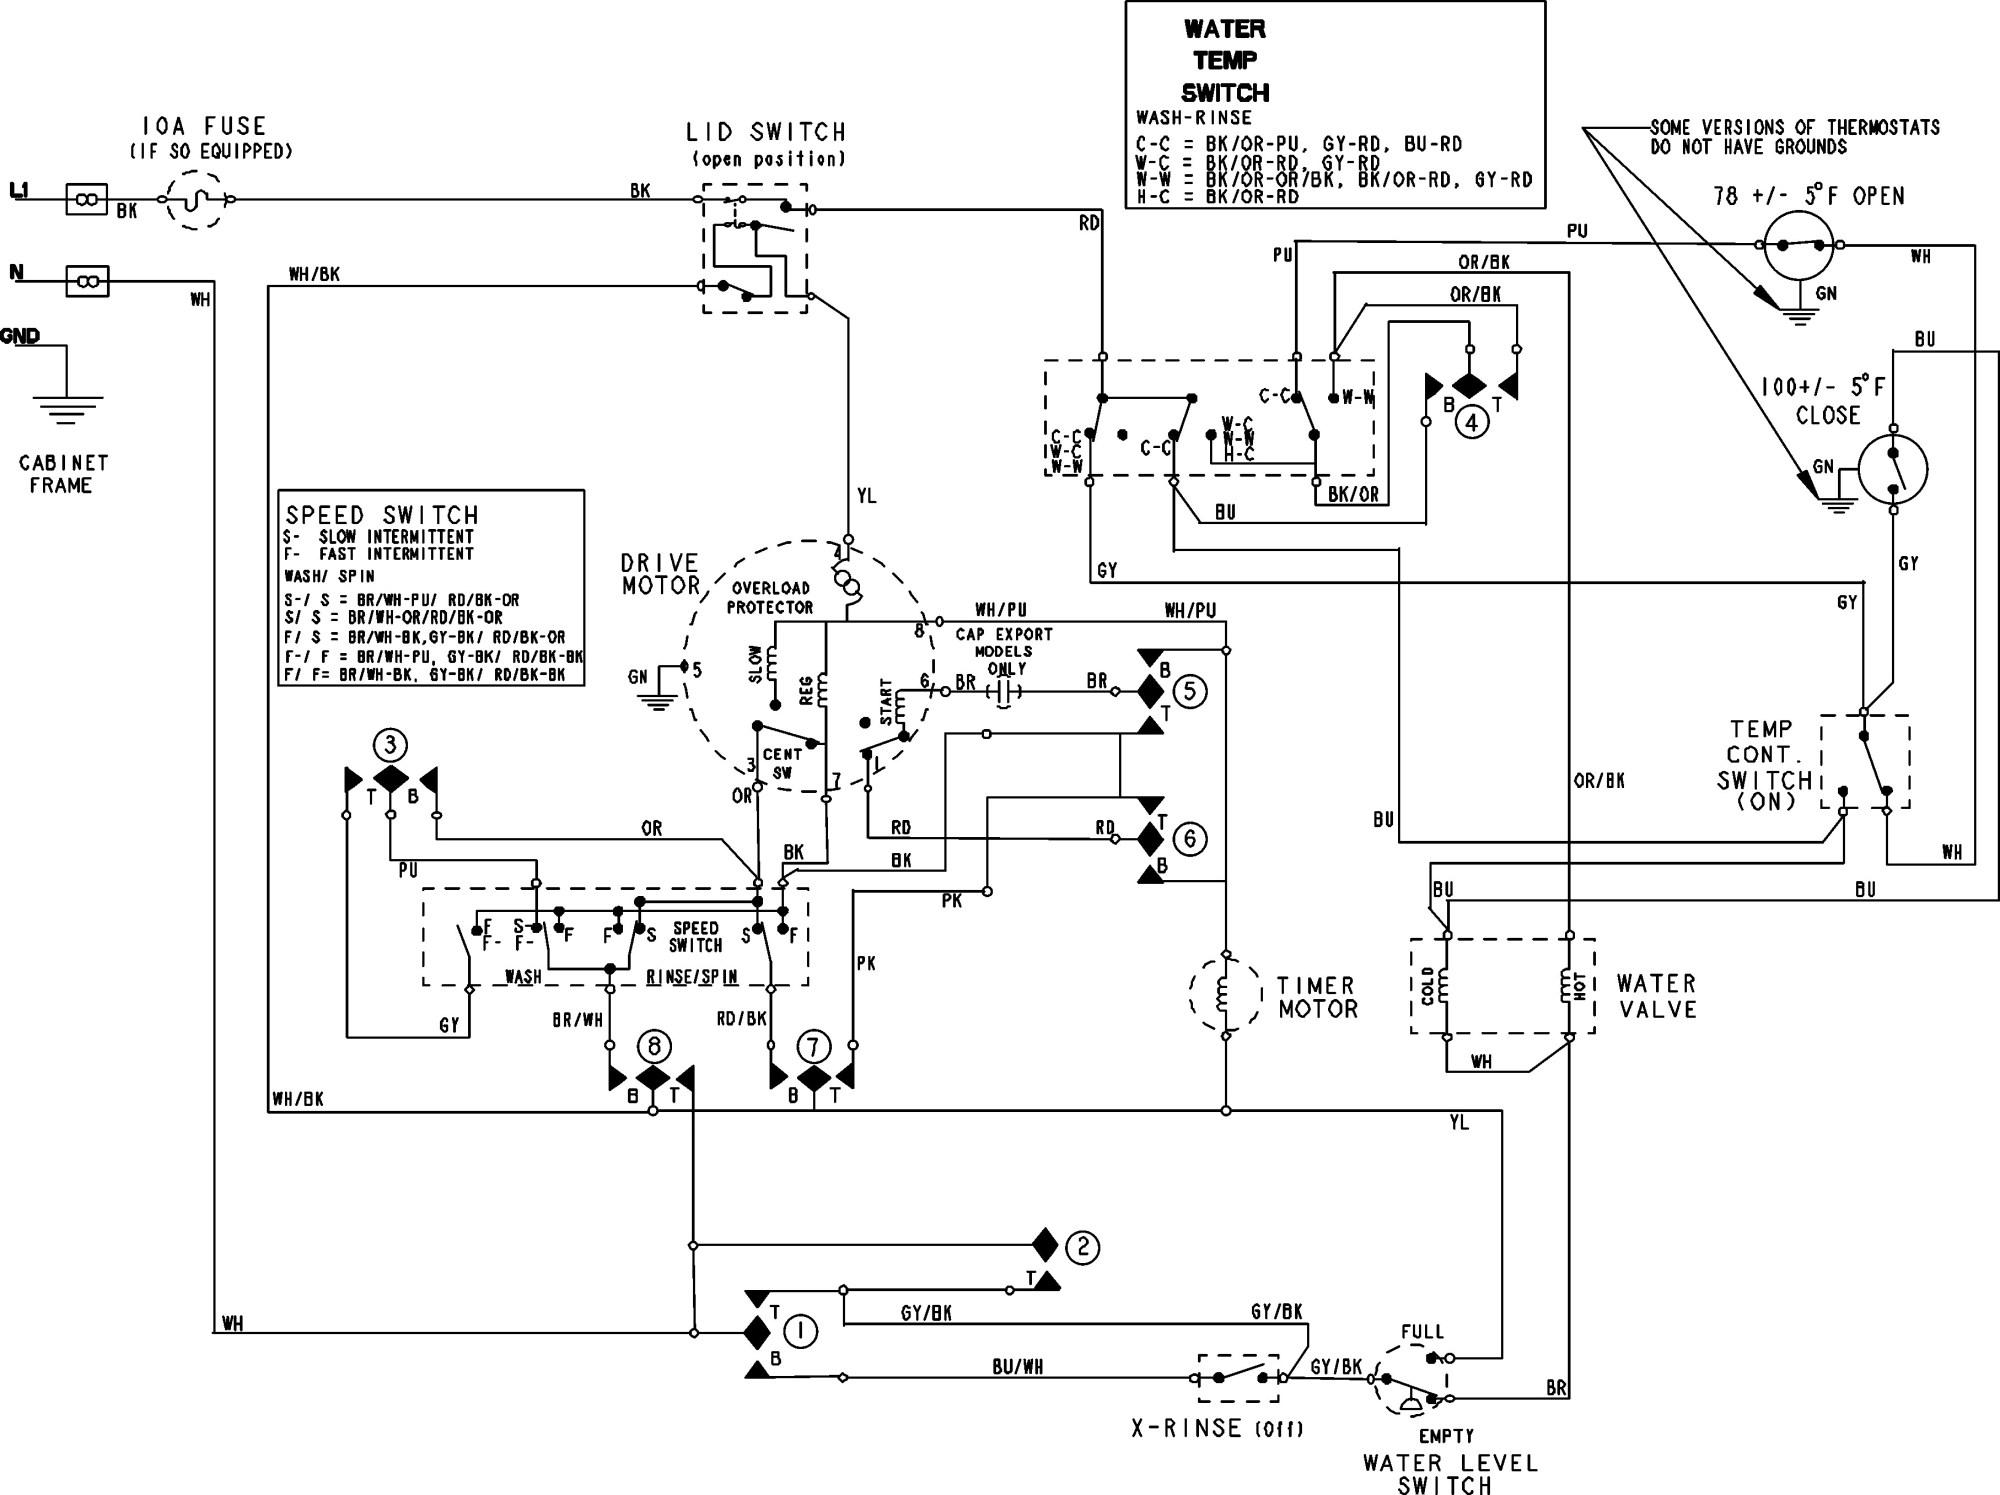 hight resolution of maytag dryer wiring schematic maytag dryer wiring diagram 4 prong fresh beautiful maytag dryer troubleshooting